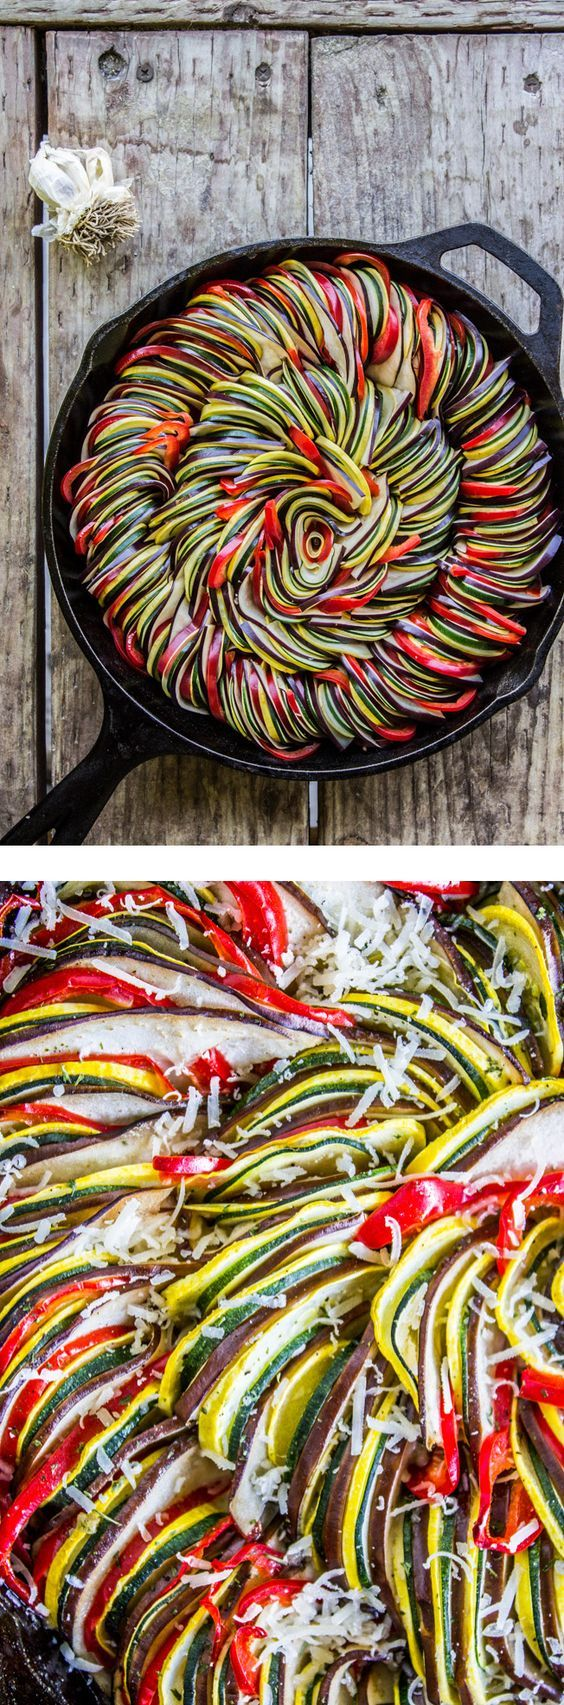 Roasted Garlic Ratatouille Recipe!